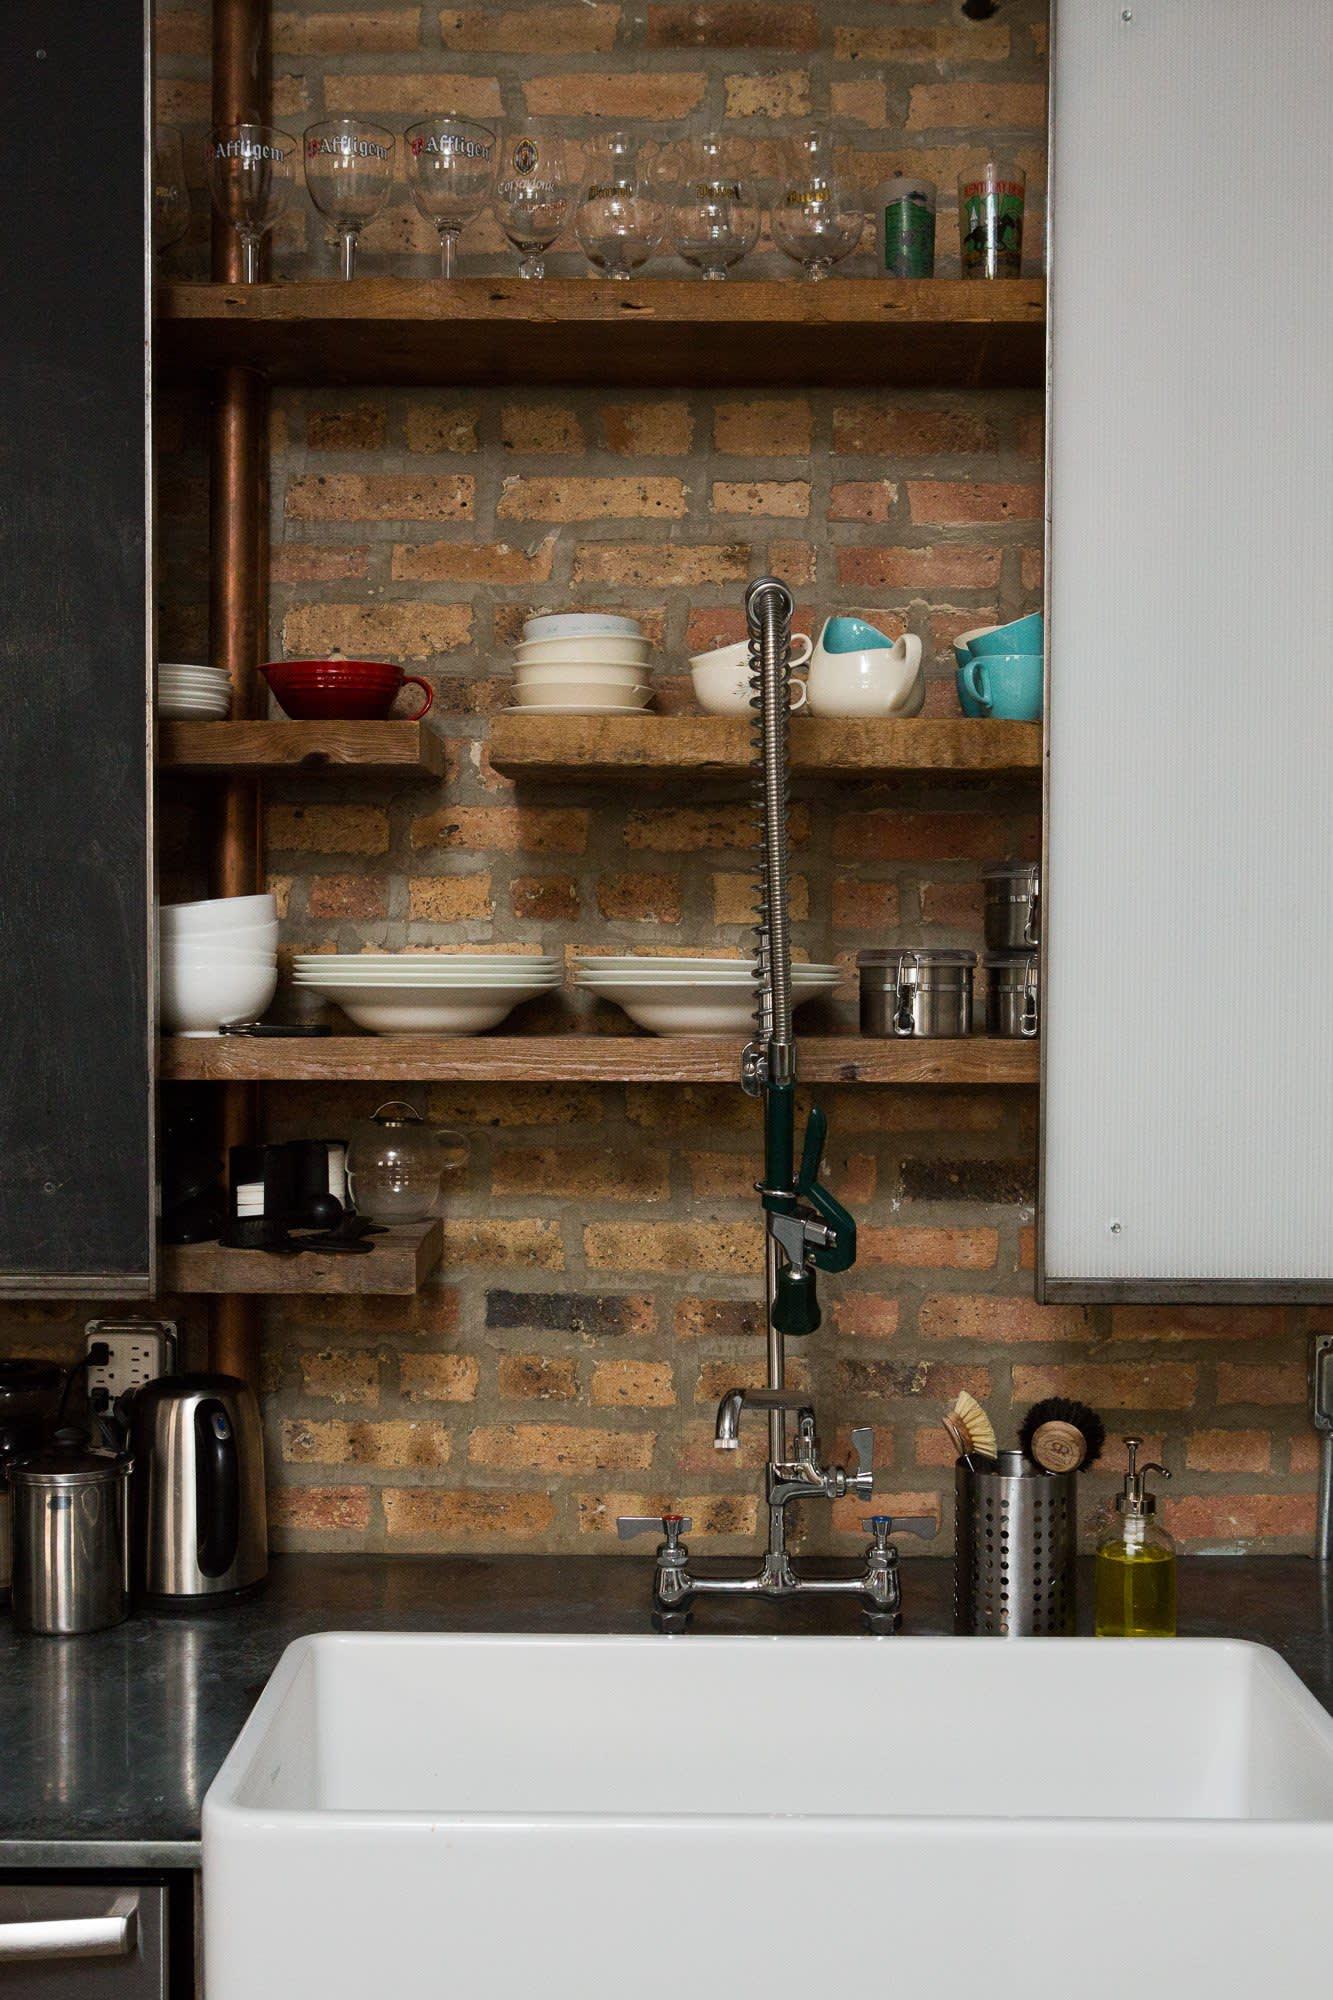 Ellen & Greg's Renovated Loft Kitchen: gallery image 4